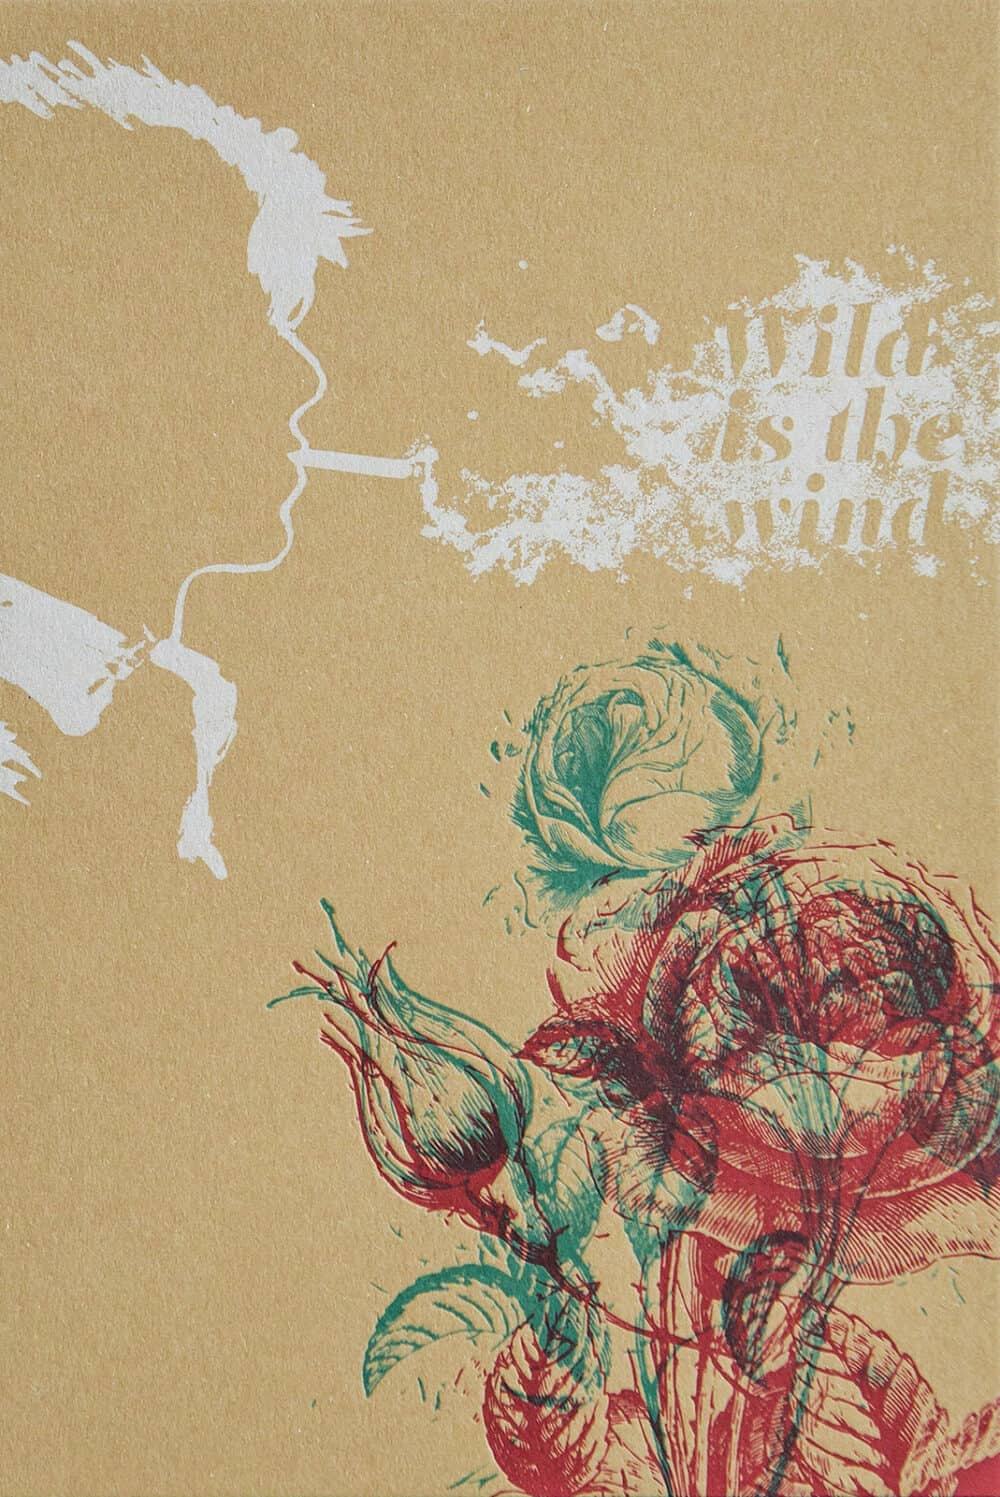 WILD IS THE WIND - Illustration originale